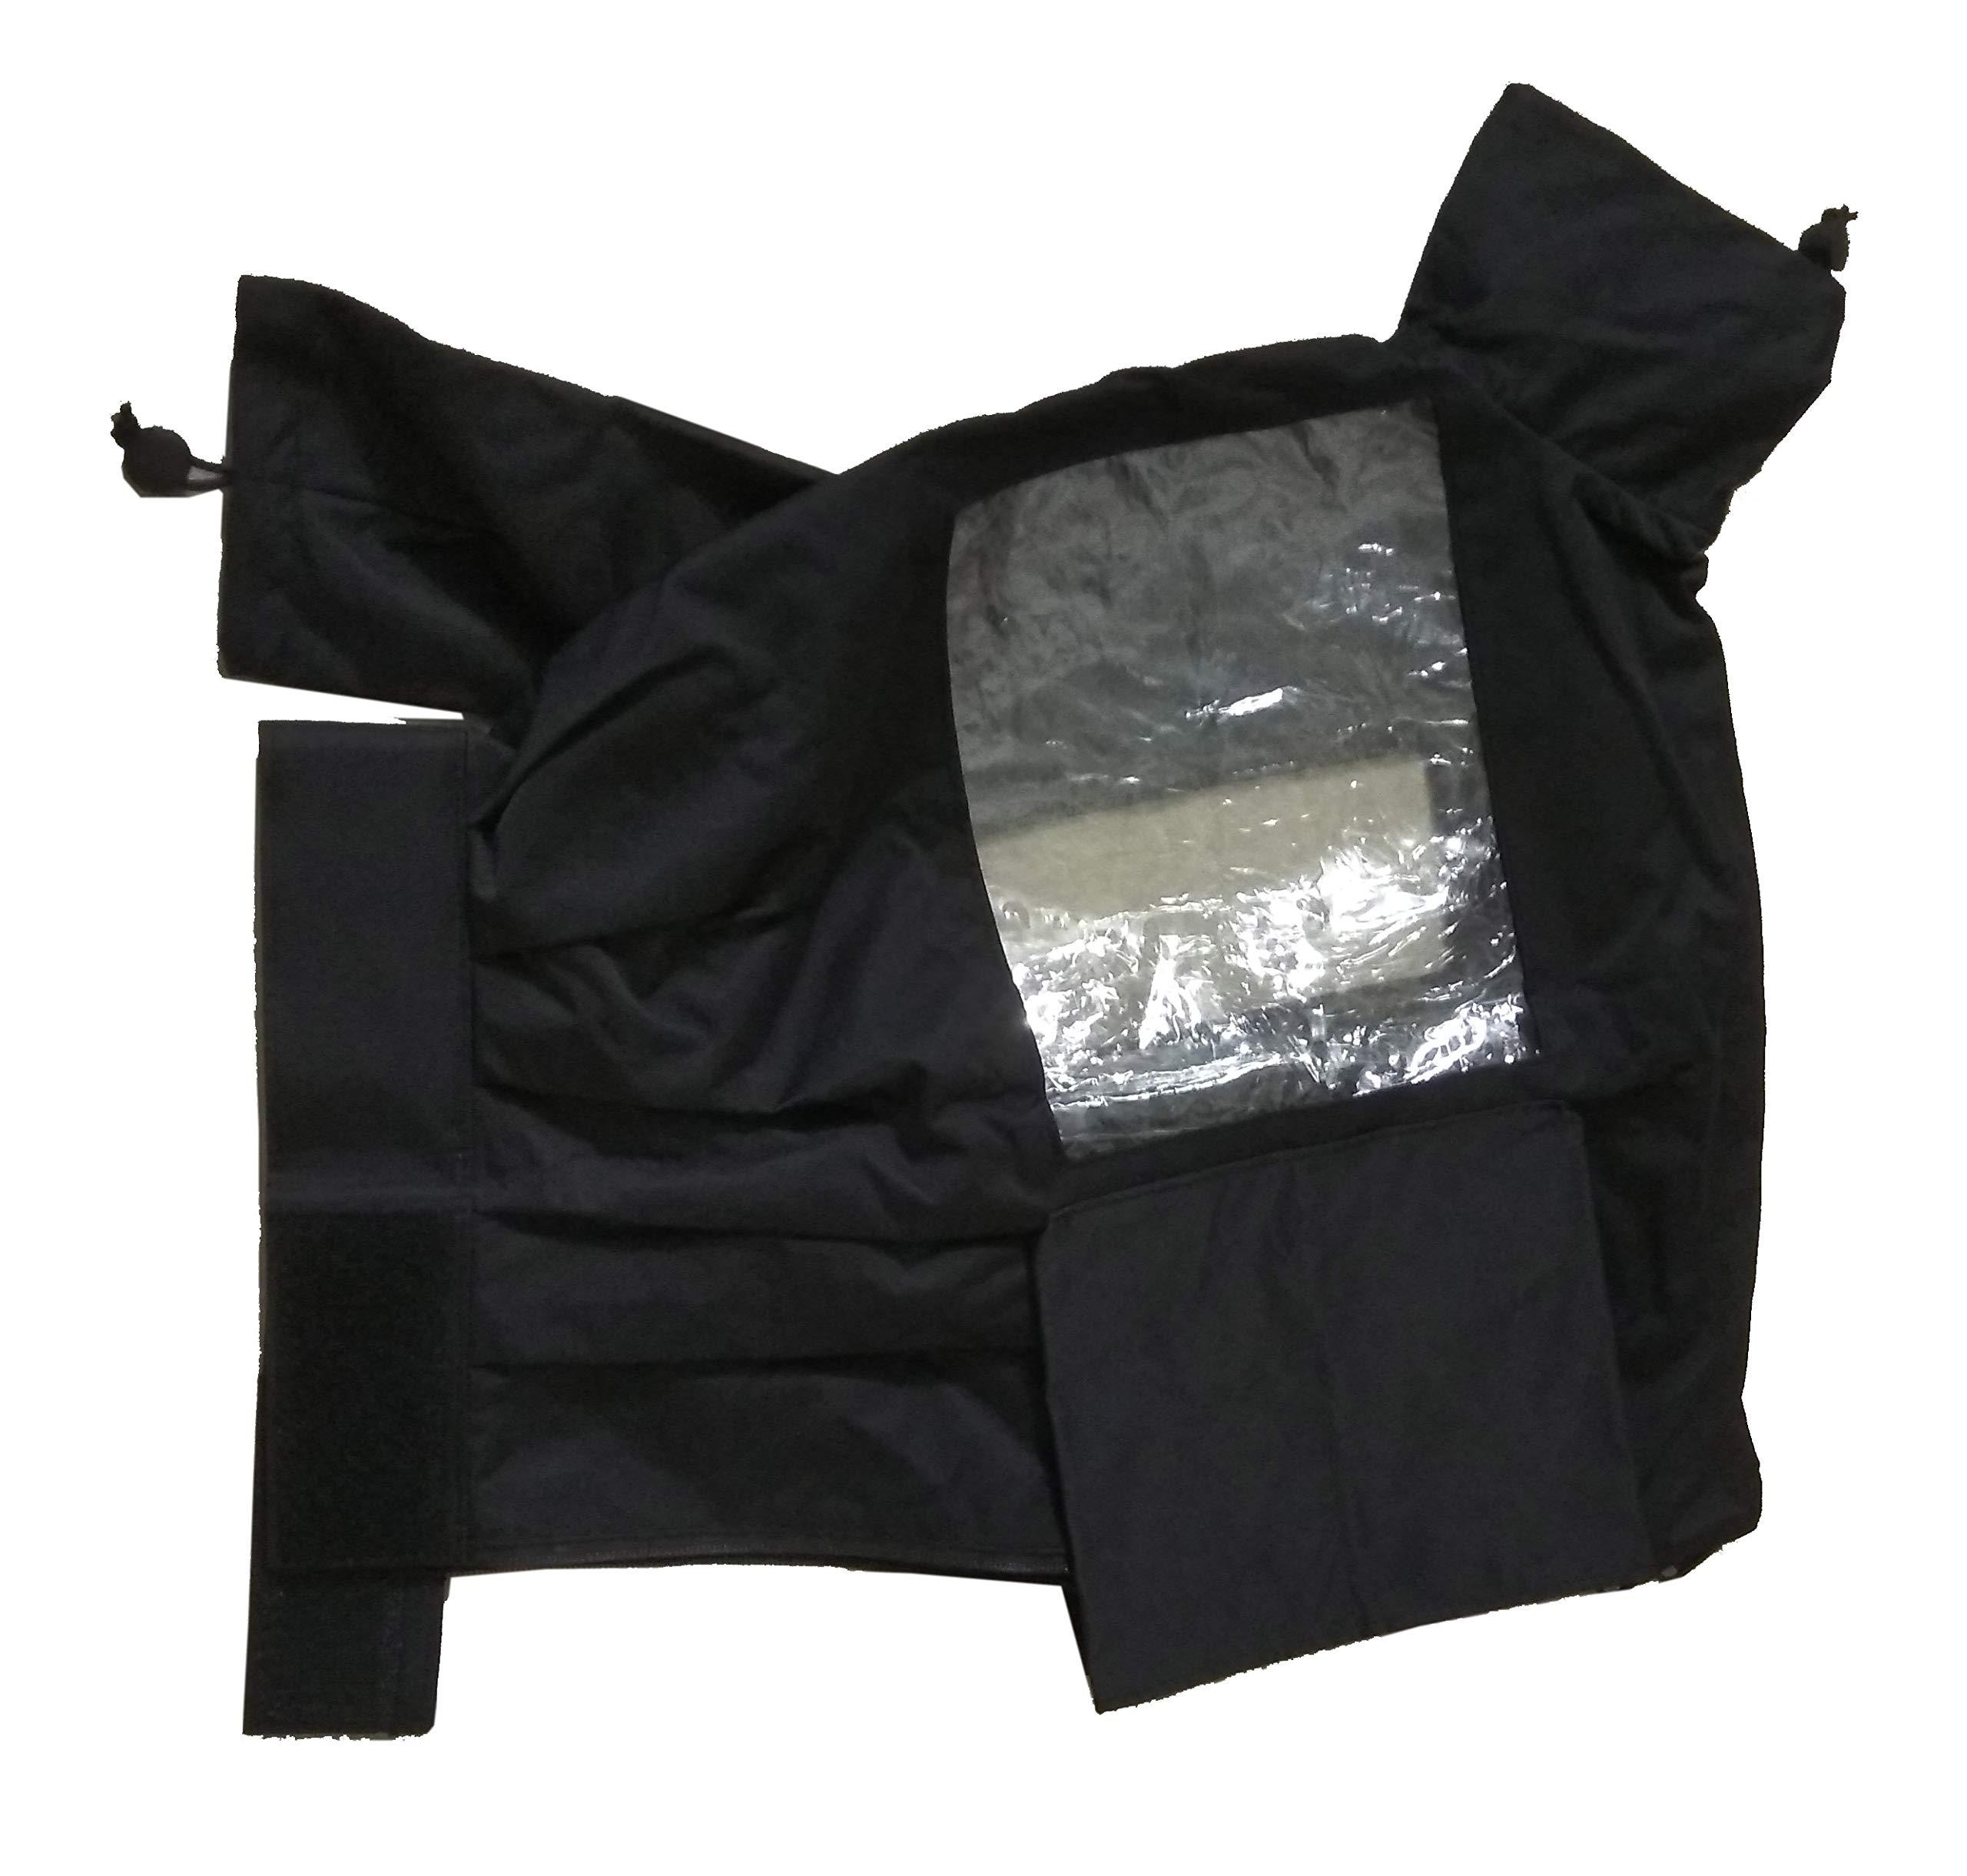 Rain Cover for Sony PXW-FS5 PXW-FS7 PXW-FS5M2 Panasonic AU-EVA1 HC-X1000 Canon XF705 XF315 xf305 JVC GY-HM660 GY-HM610 HM650 HM600 Camcorder by FOREST BRAVE (Image #5)